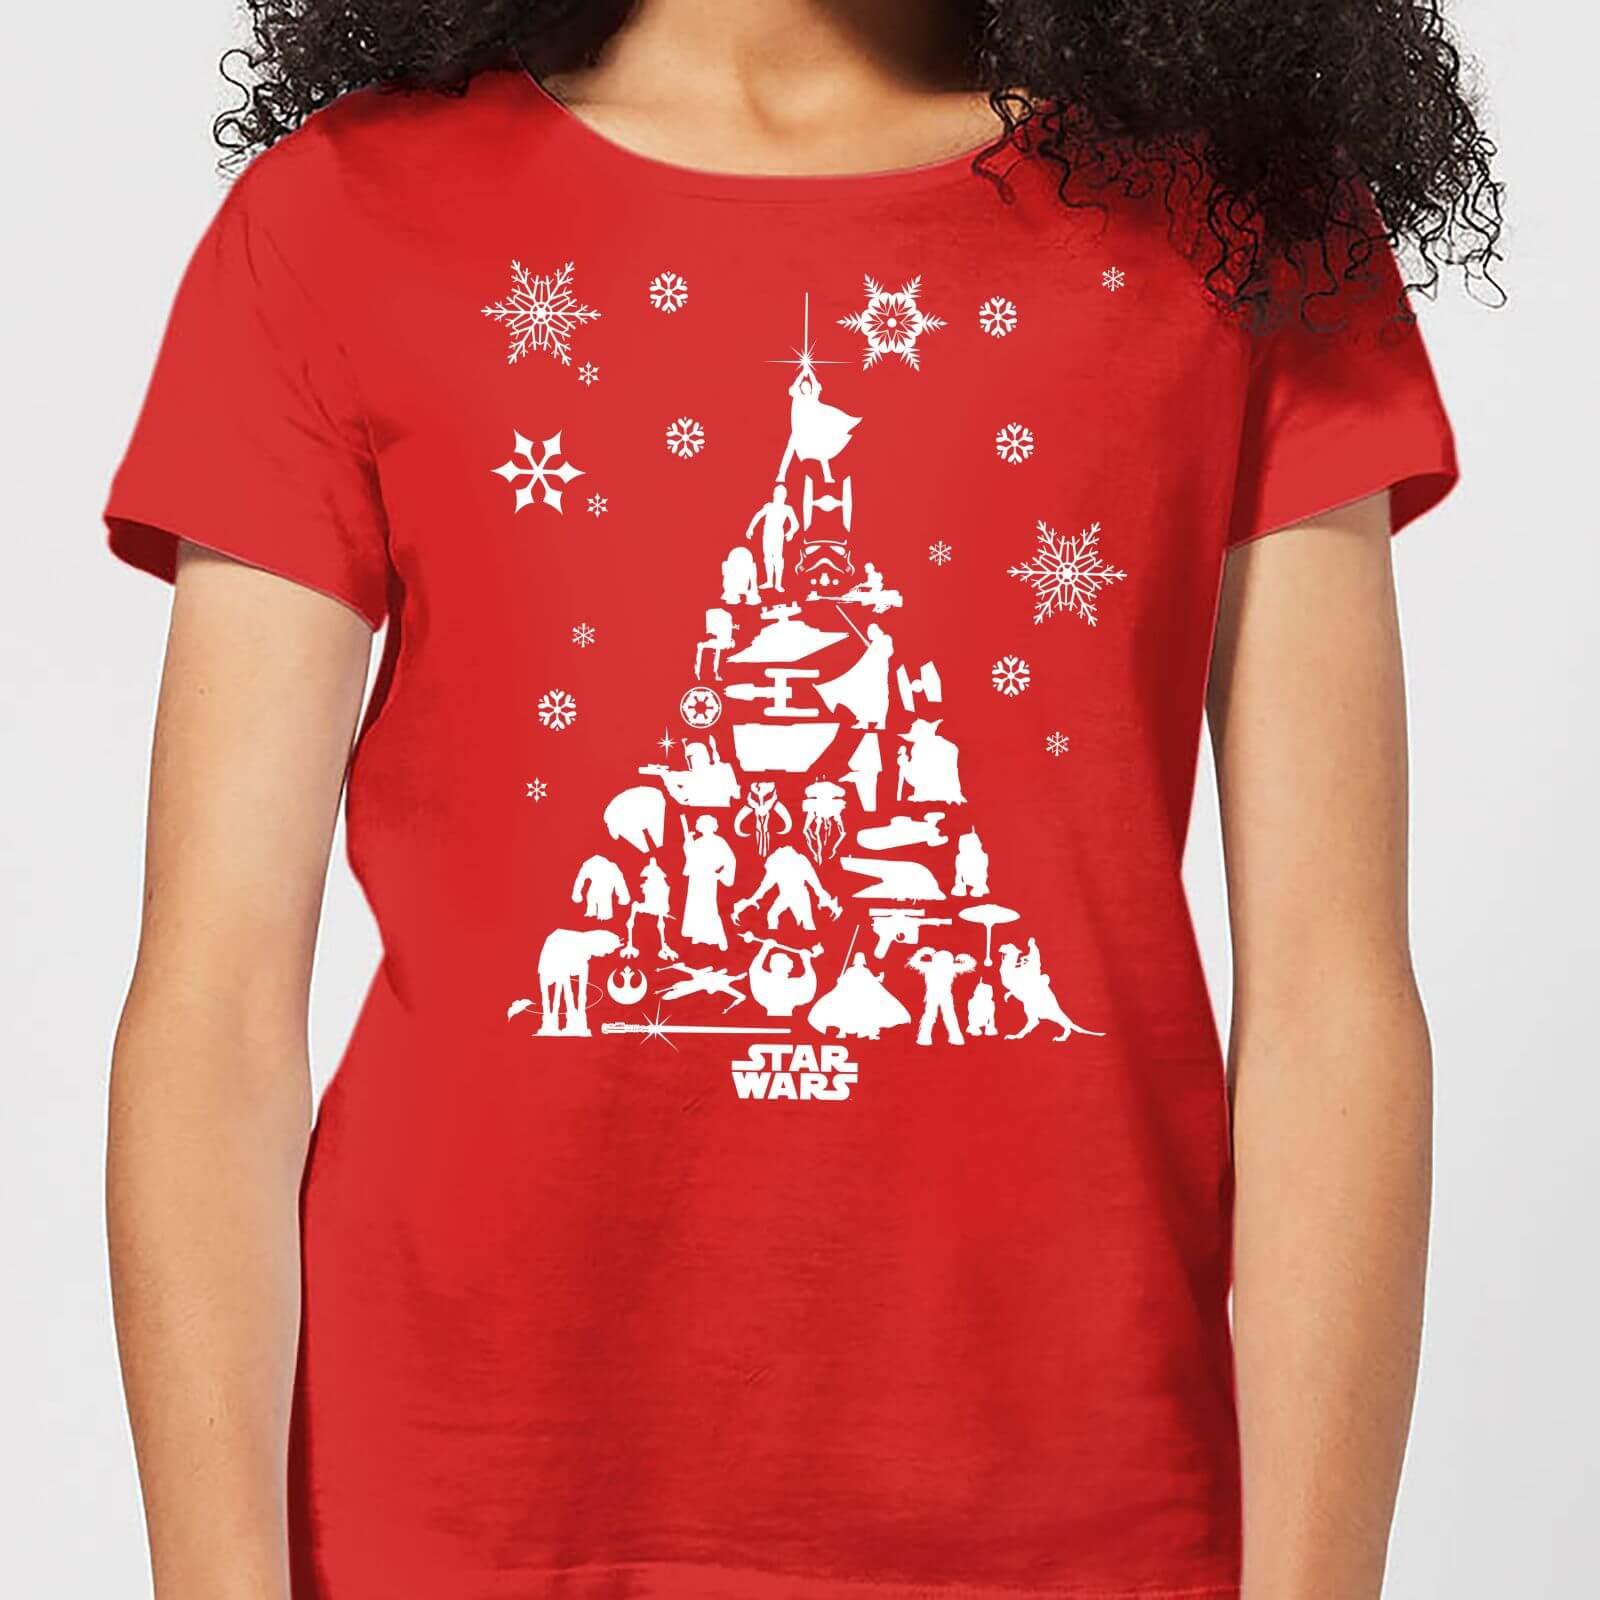 d82c108bfad ... tree  search results for  u201choodiii womens festive christmas t  shirthoodiii womens festive christmas t shirt distressed  amazon co uk  hoodiii ...